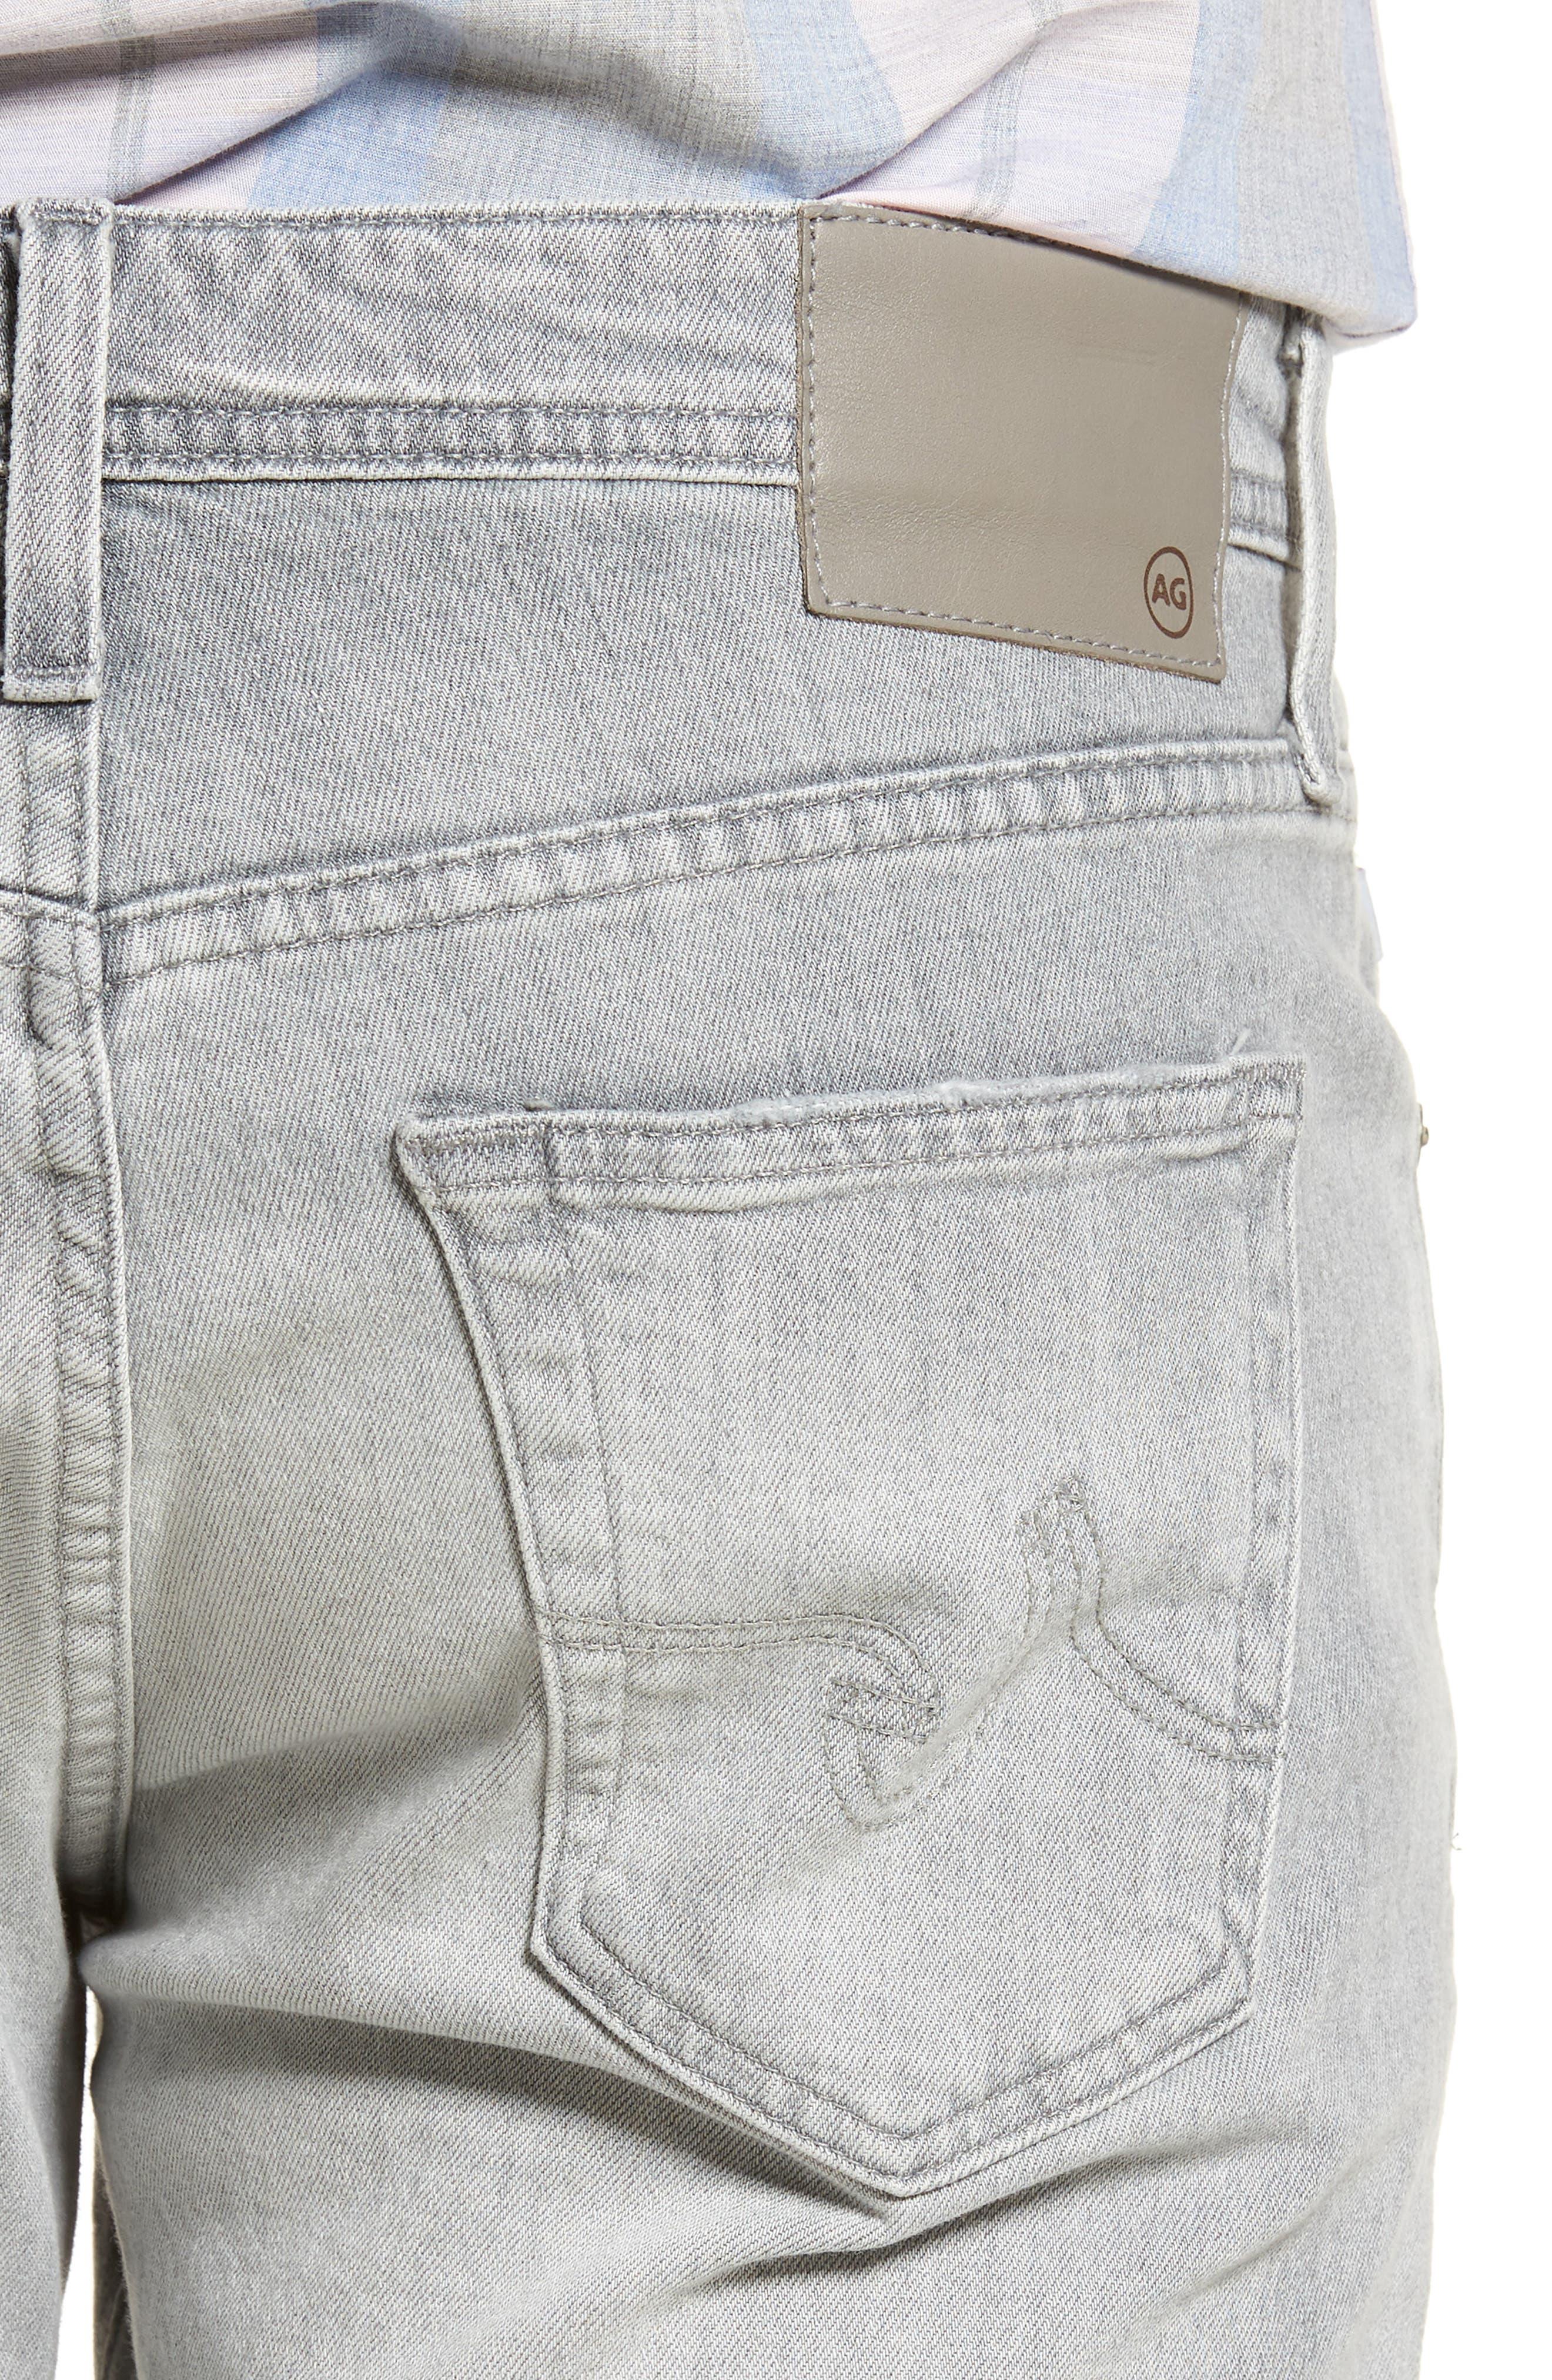 Graduate Slim Straight Leg Jeans,                             Alternate thumbnail 4, color,